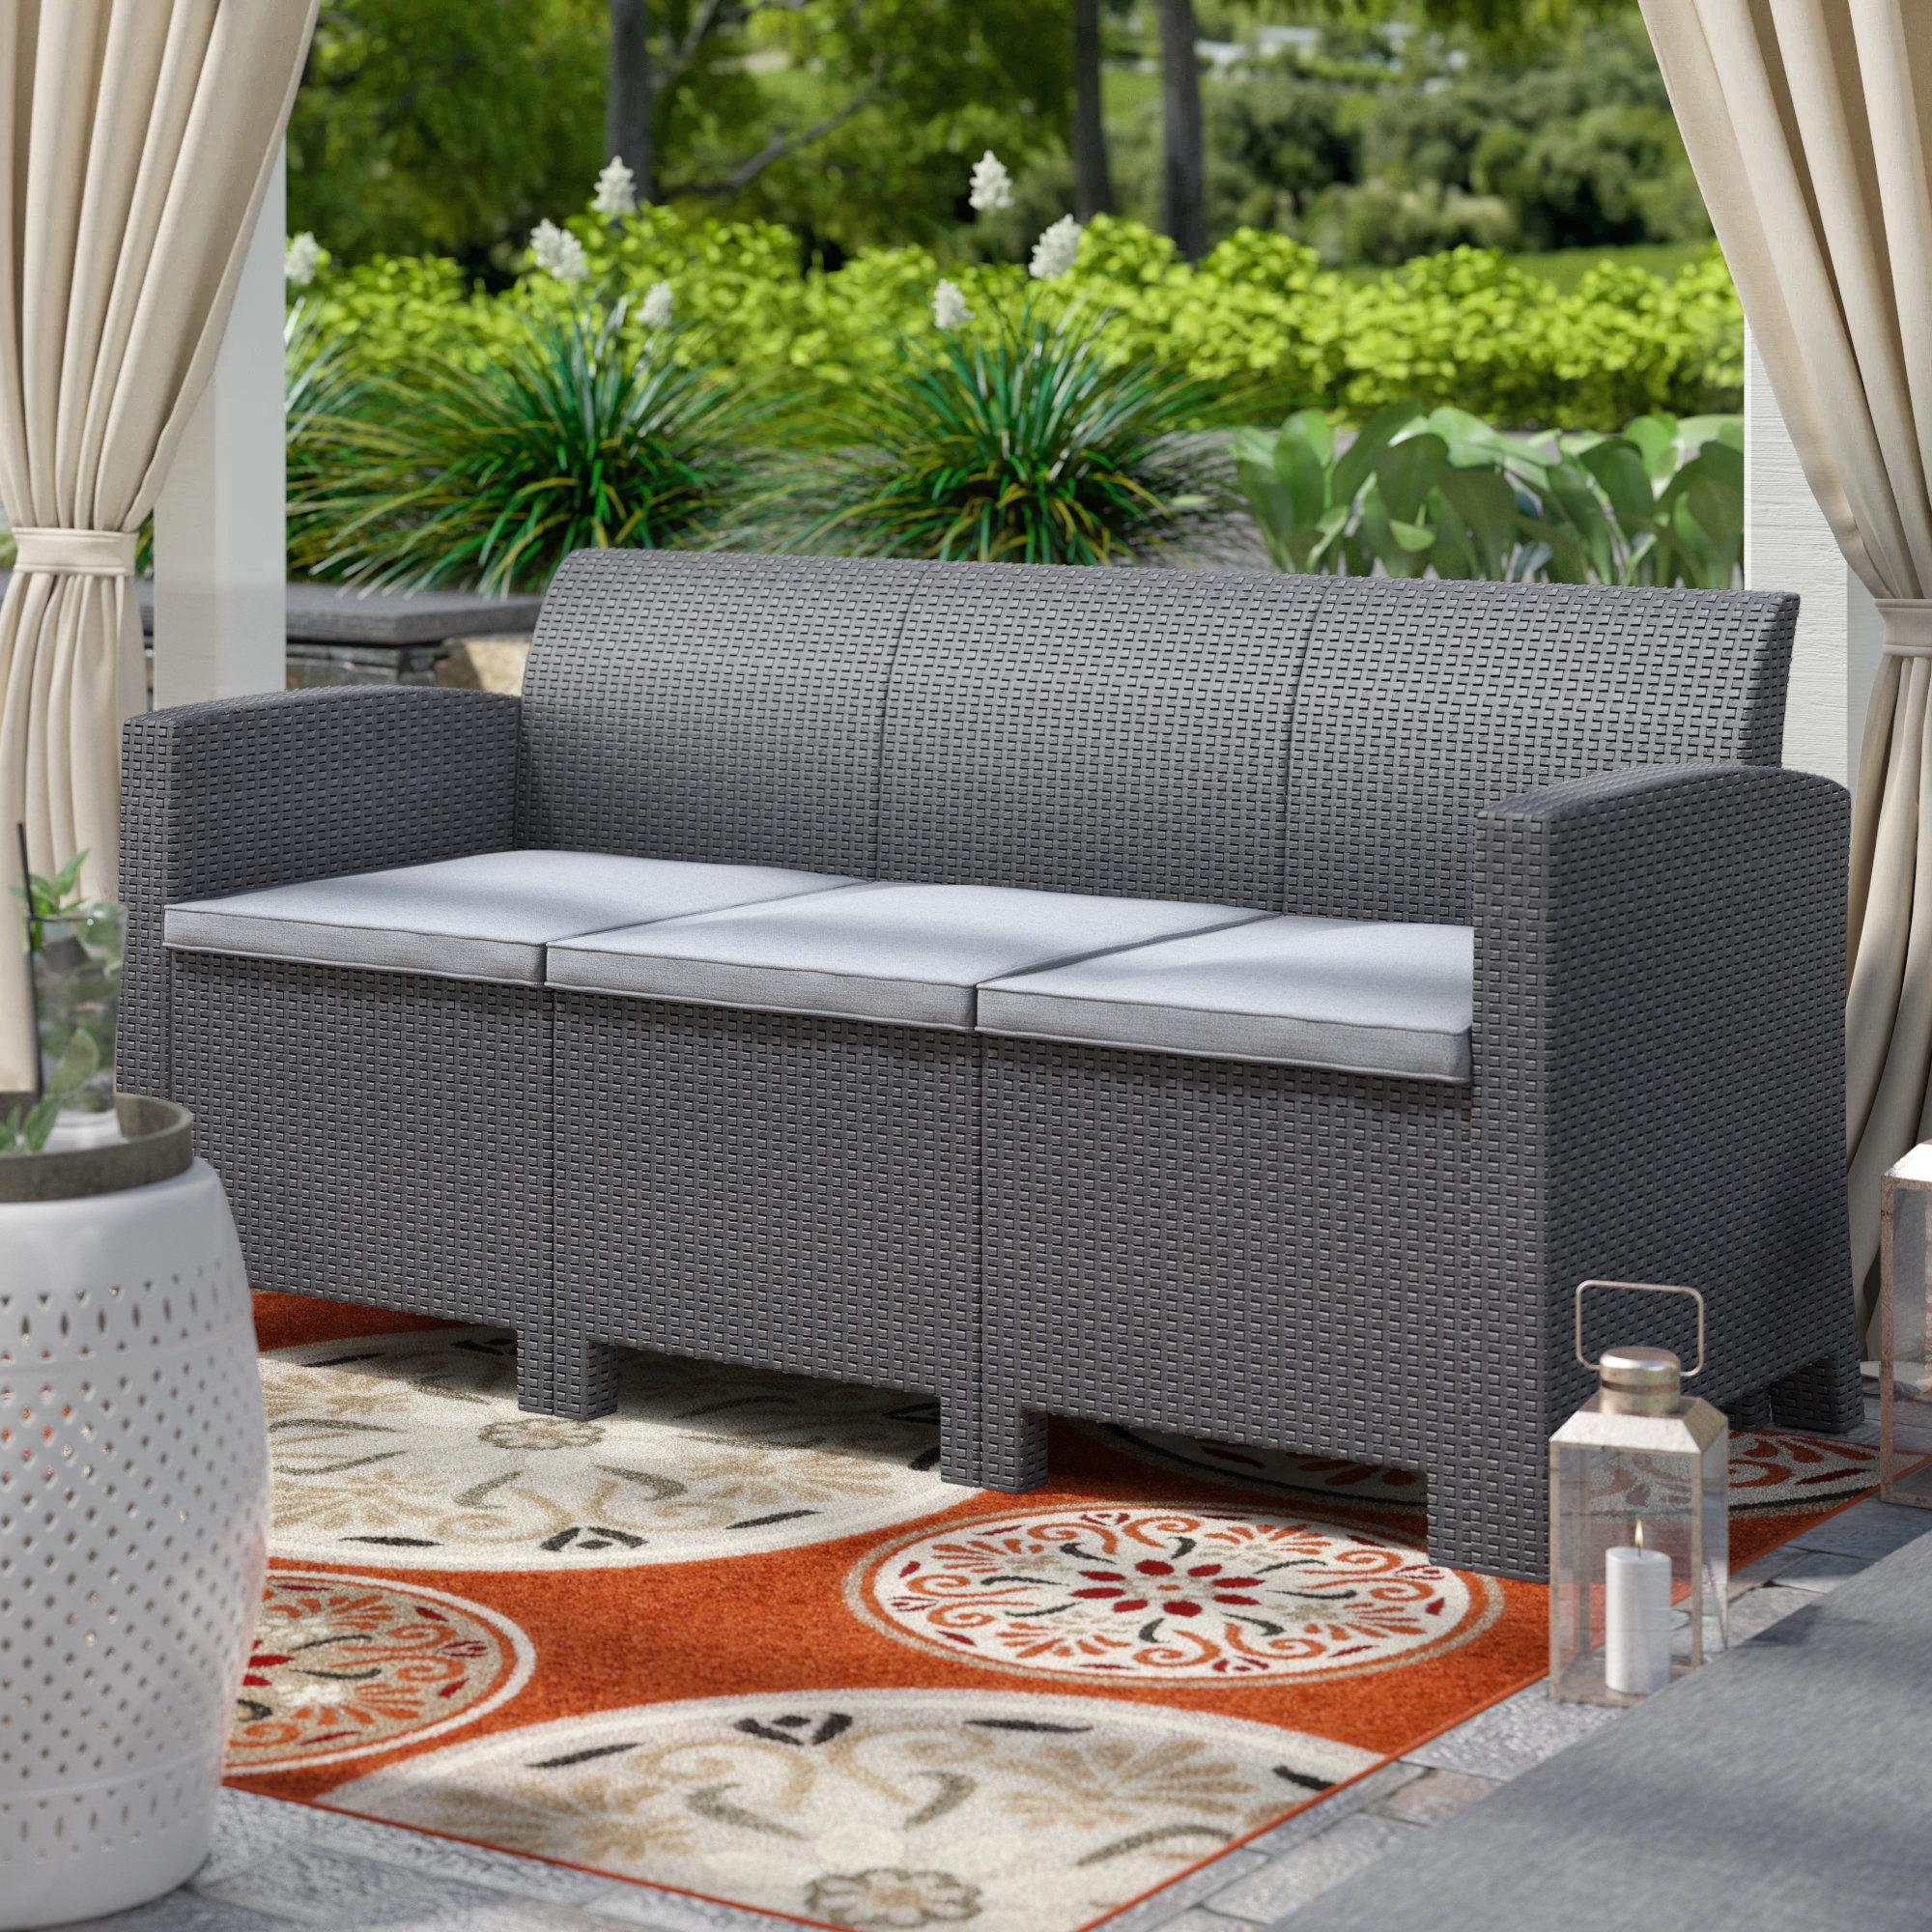 Favorite Yoselin Patio Sofa With Cushions Inside Clifford Patio Sofas With Cushions (View 6 of 20)